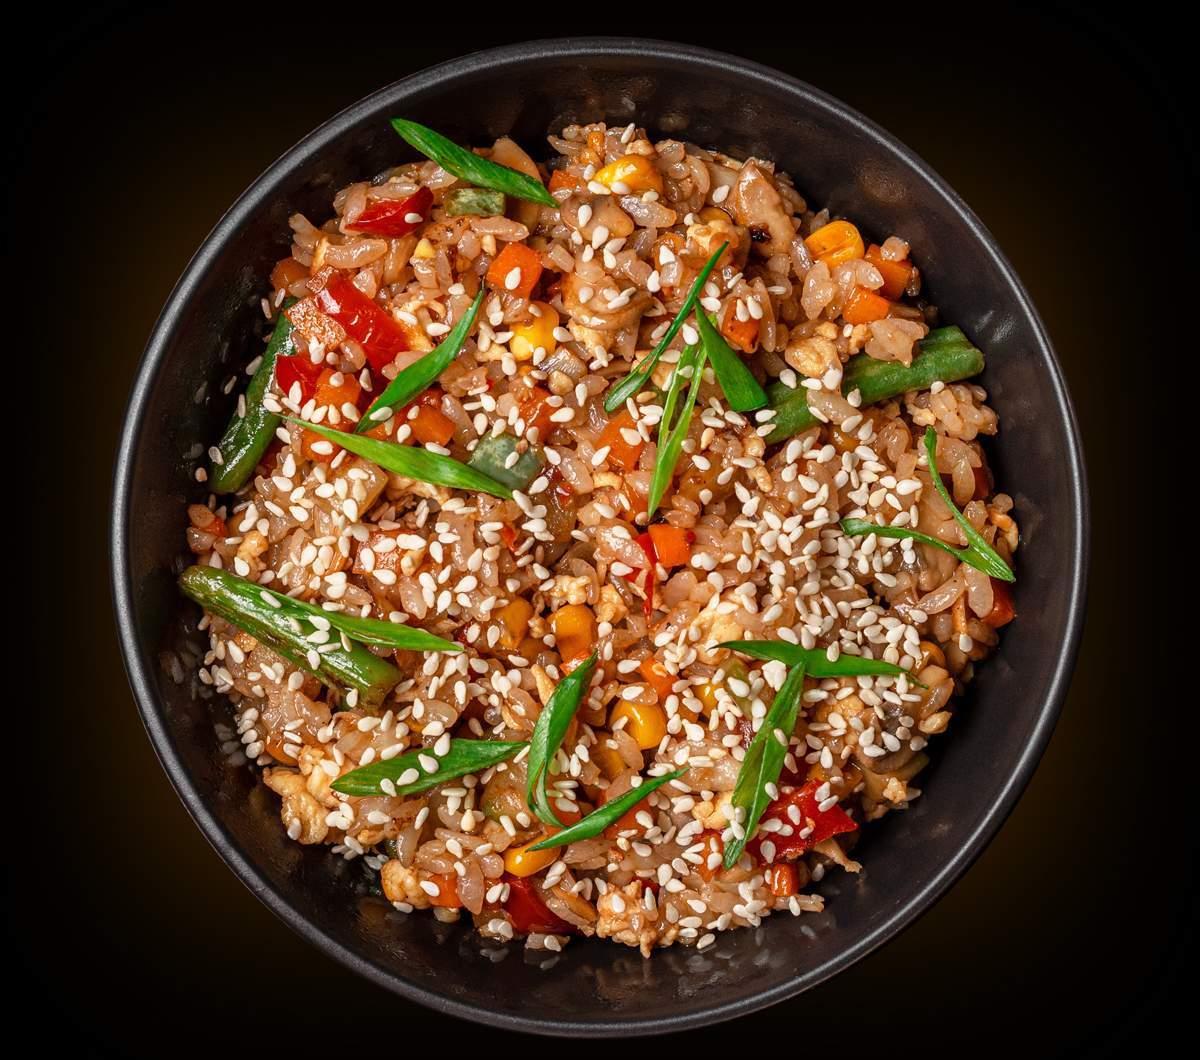 заказать: WOK - Тяхан с овощами